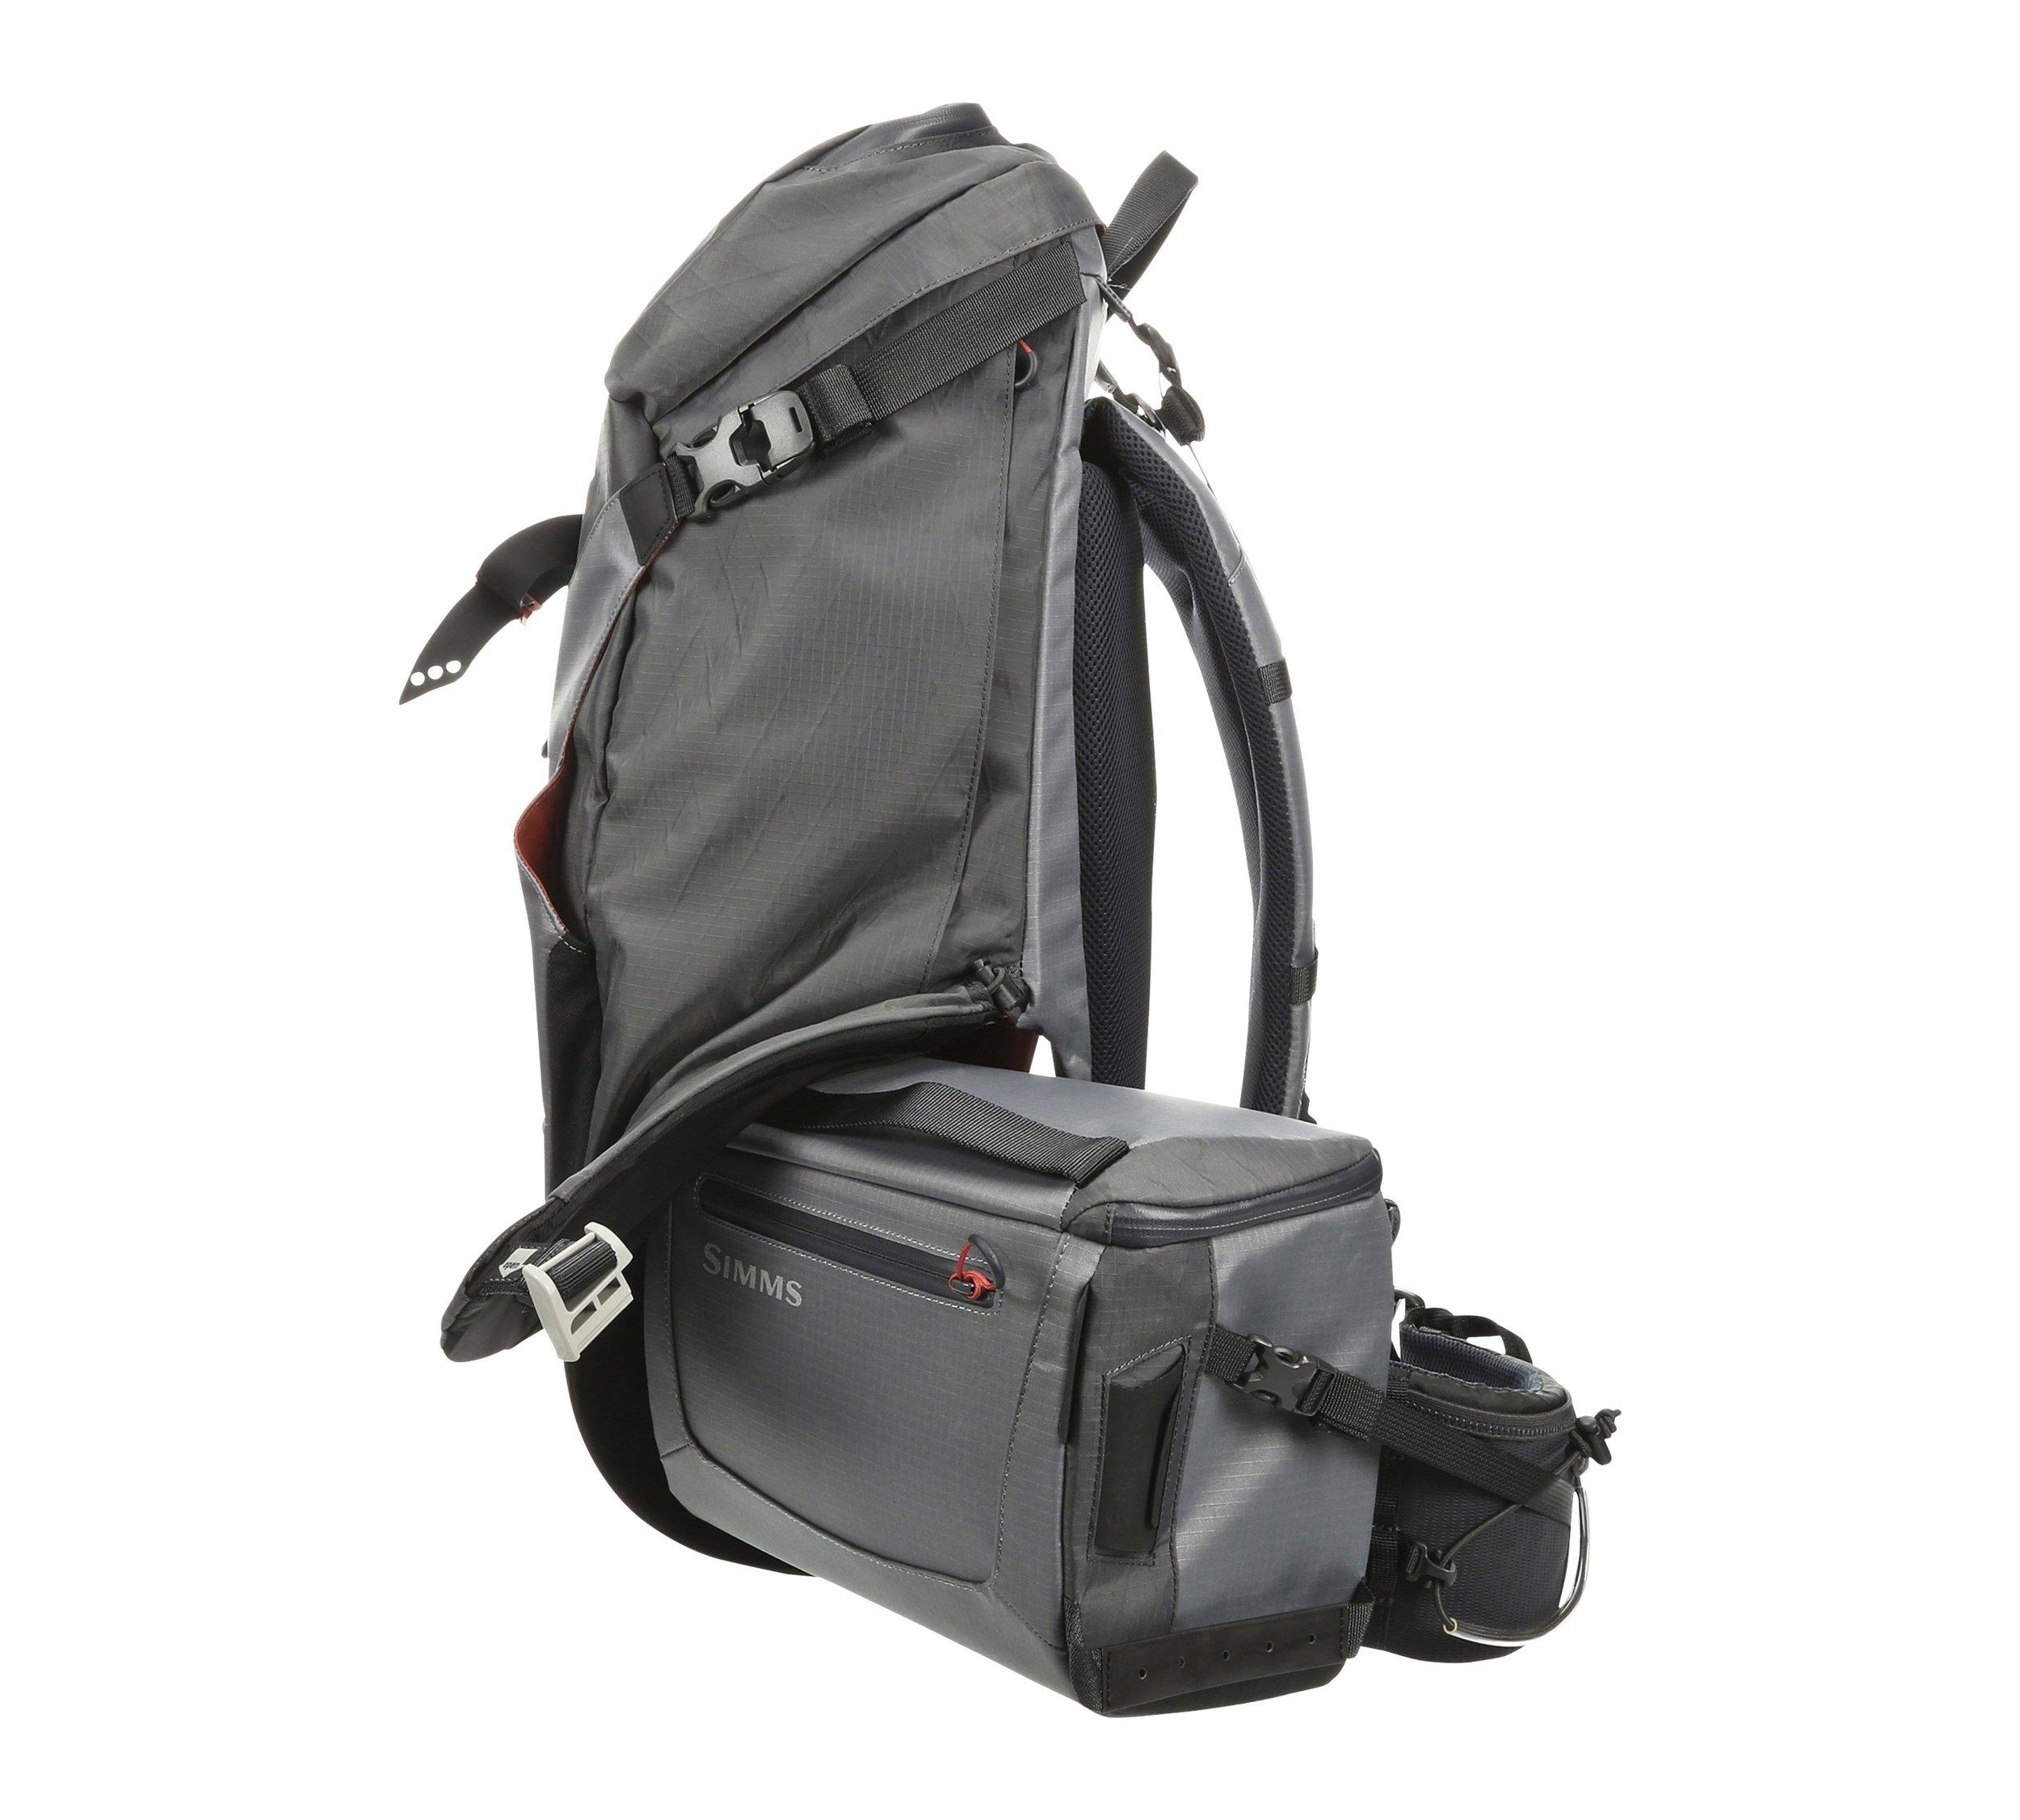 Simms G4 PRO Shift Pack:  https://ironbowflyshop.ca/products/g4-pro-shift-fishing-backpack